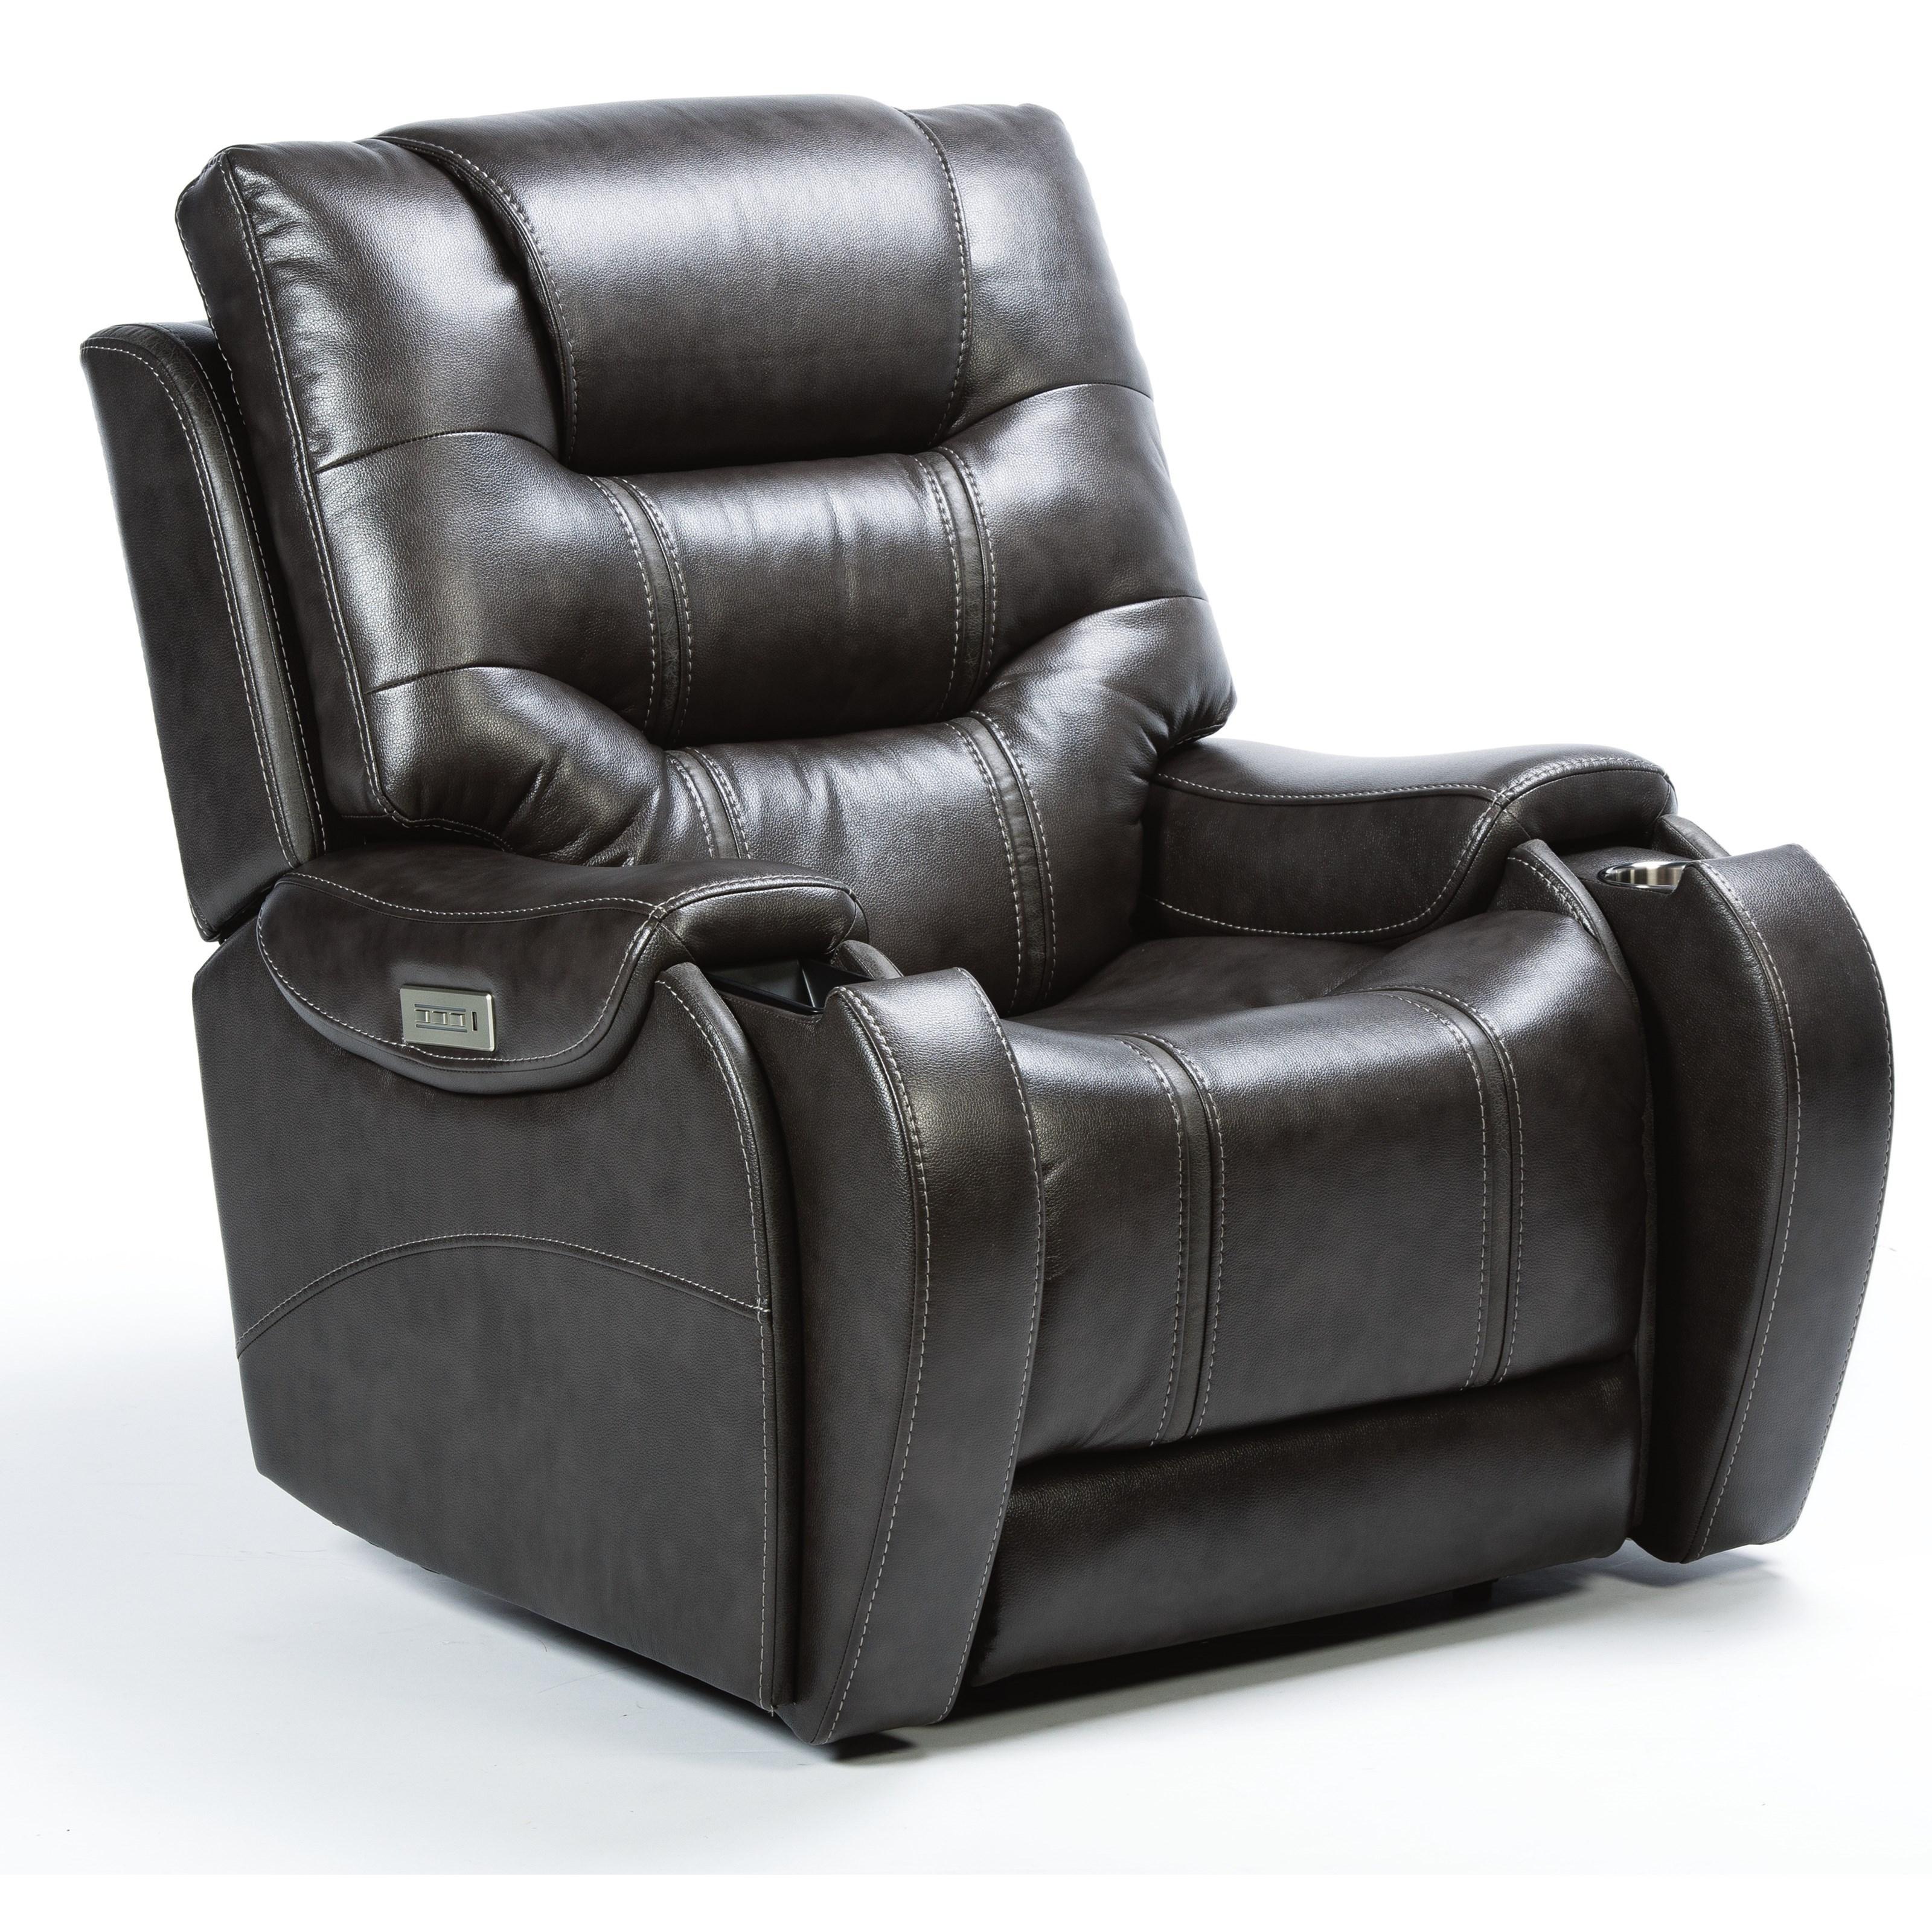 Latitudes - Sinclair Power Recliner by Flexsteel at Walker's Furniture